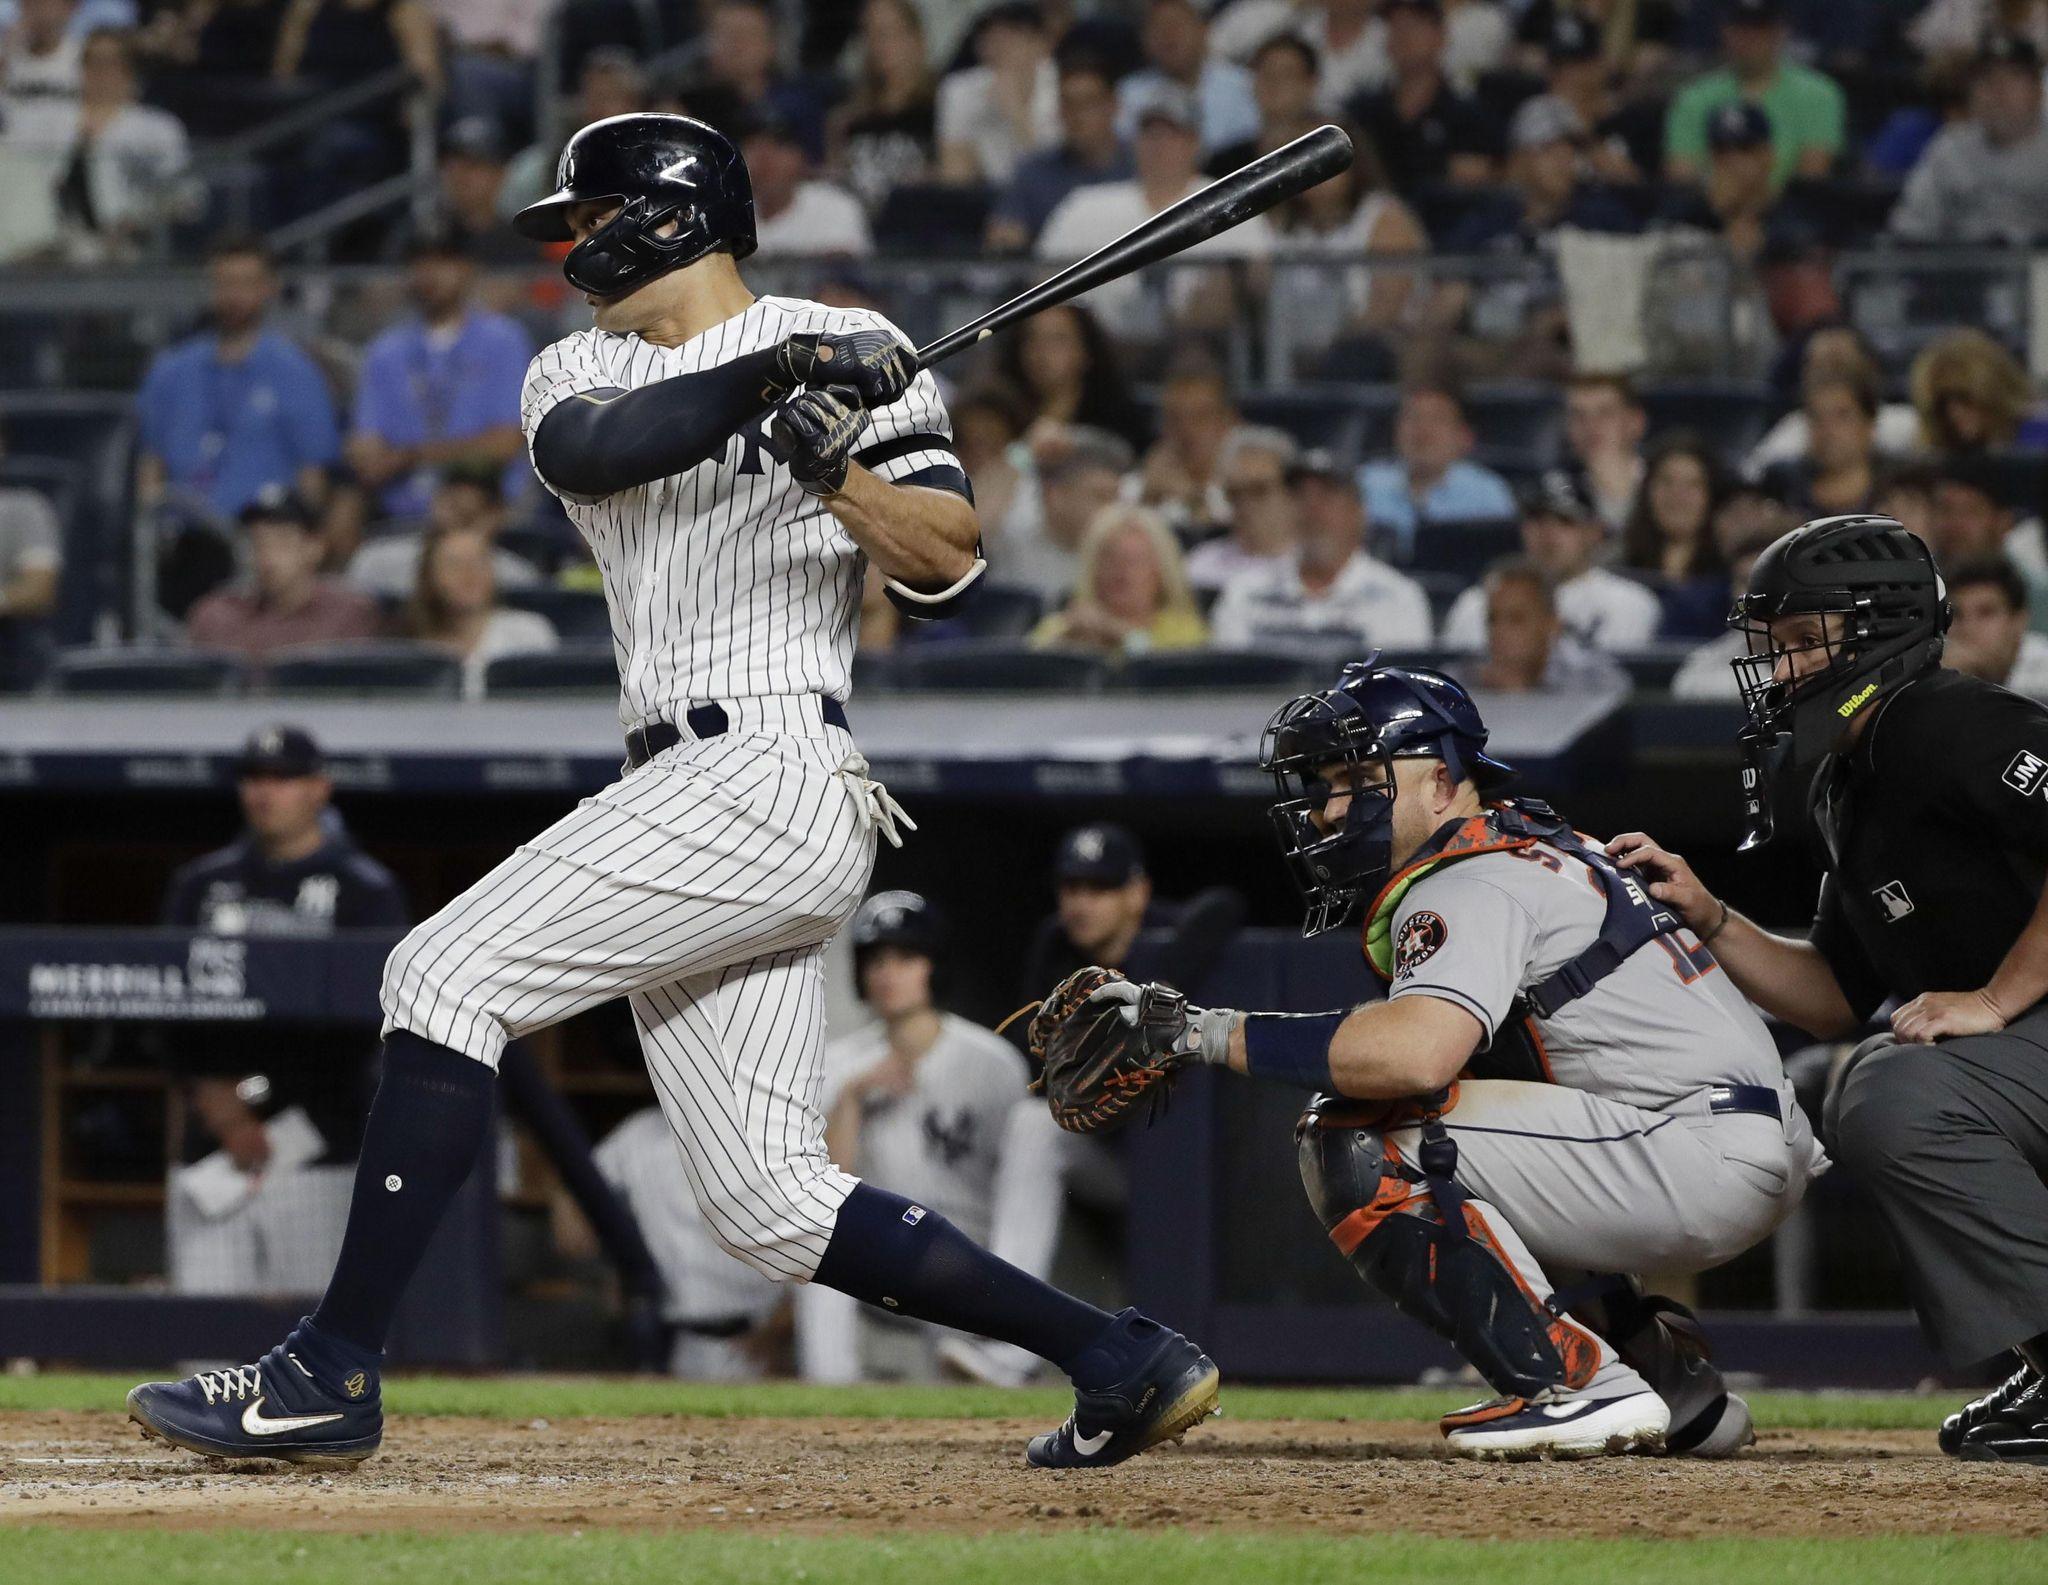 Astros_yankees_baseball_46254_s2048x1585